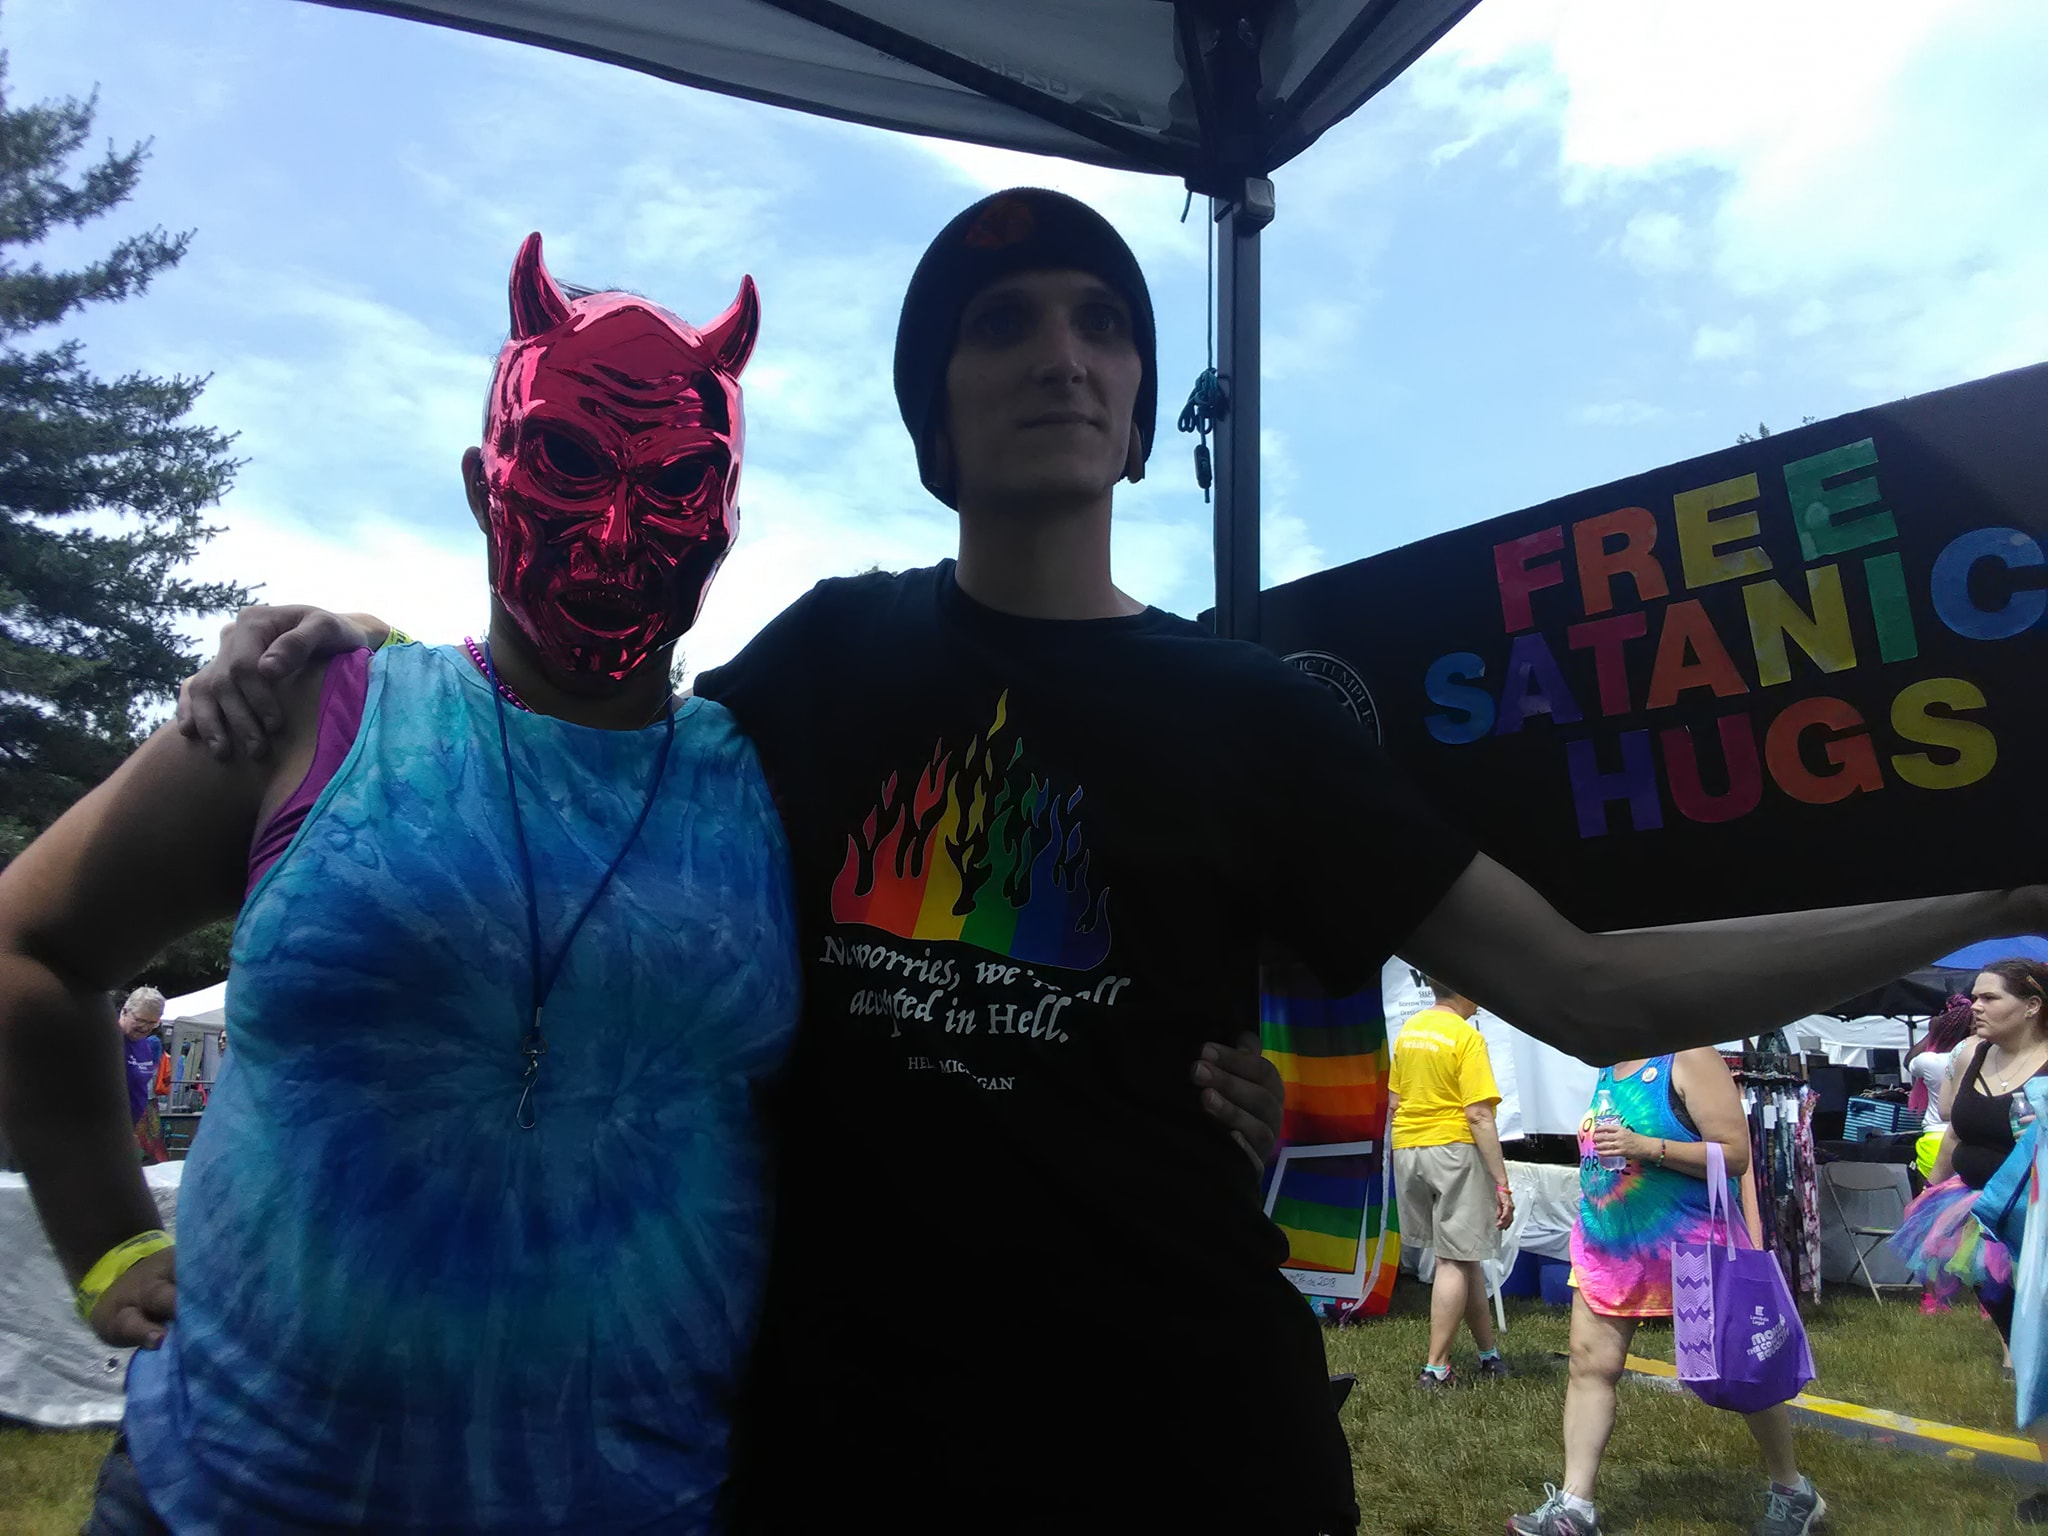 Satanic Hugs